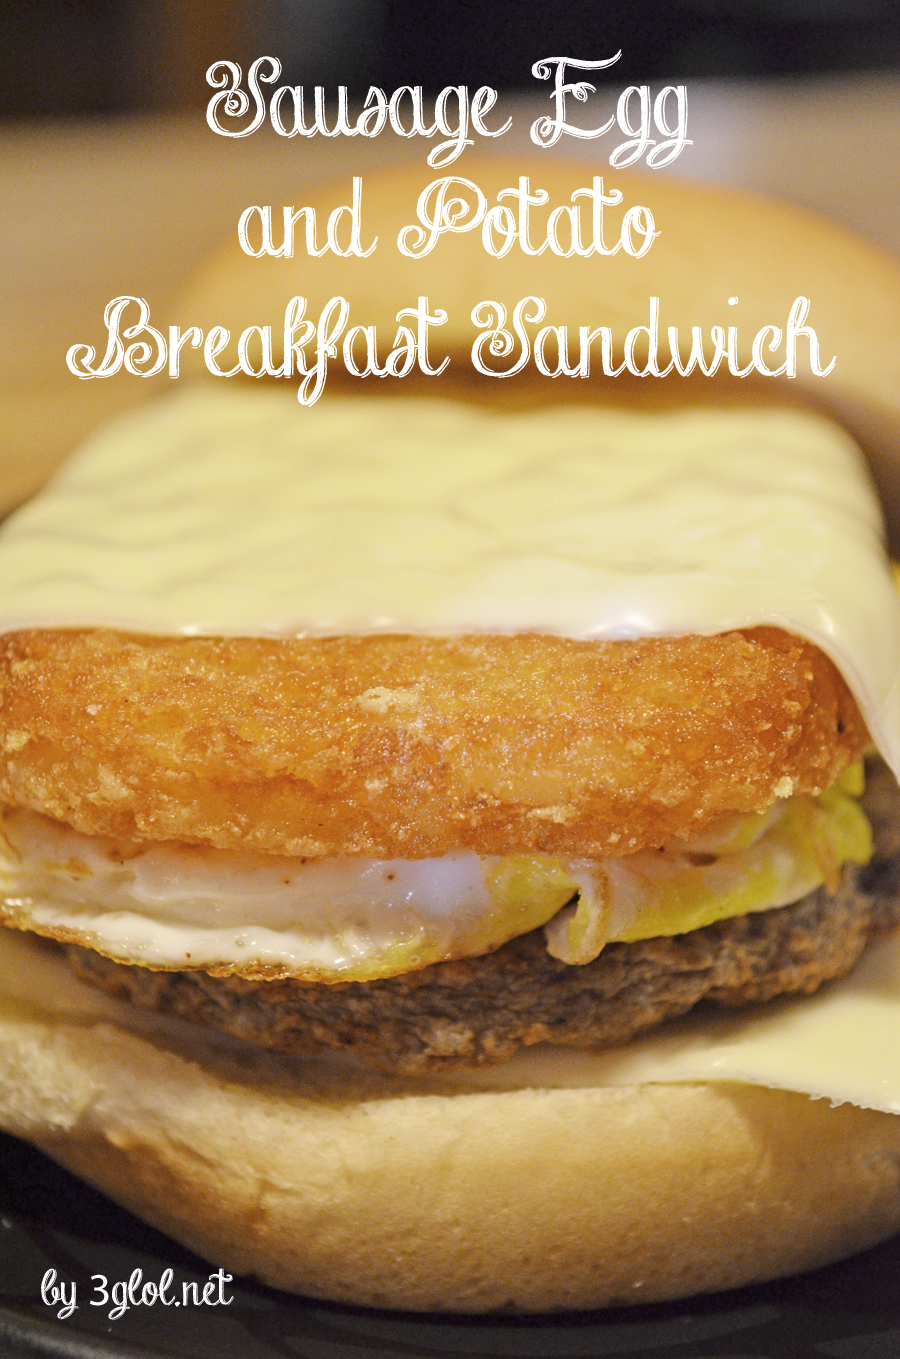 Sausage Egg and Potato Breakfast Sandwich